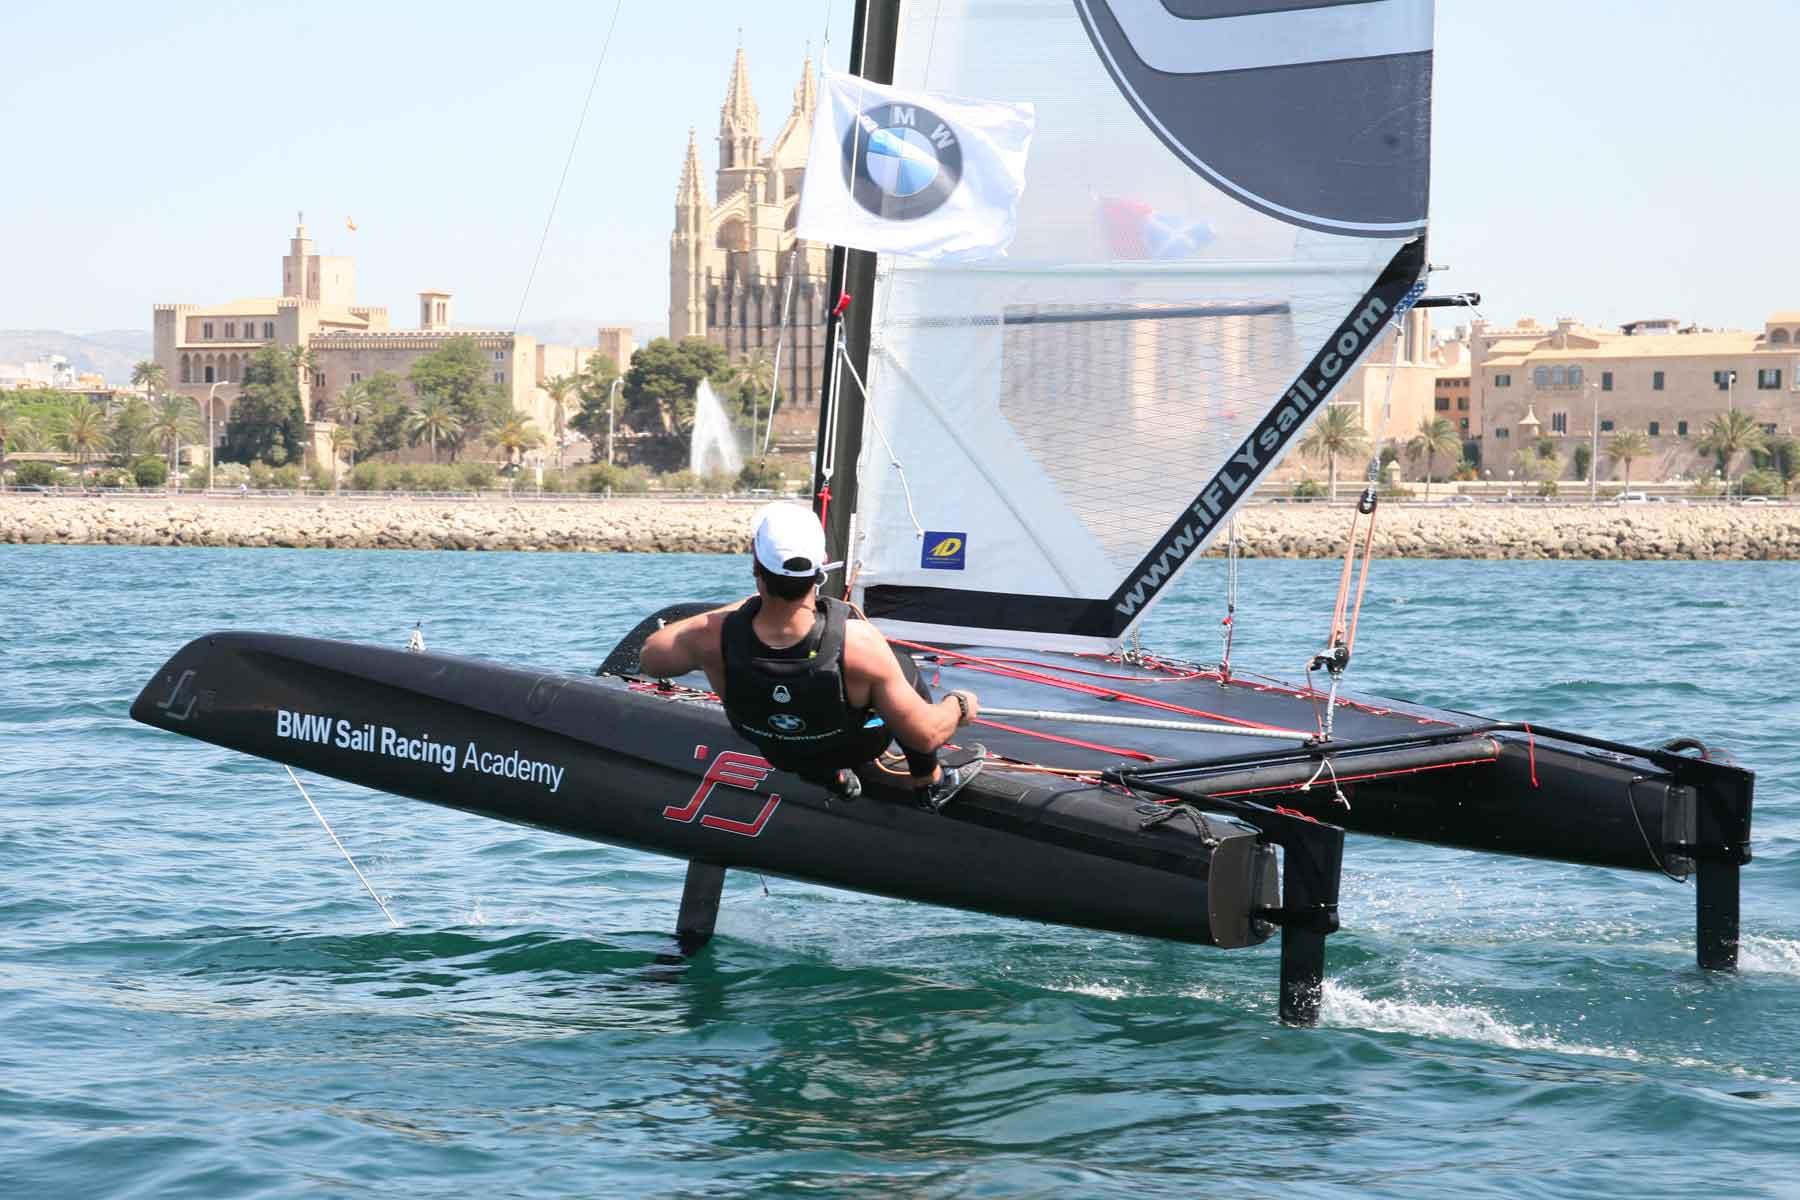 BMW sailracing Akademie foiling